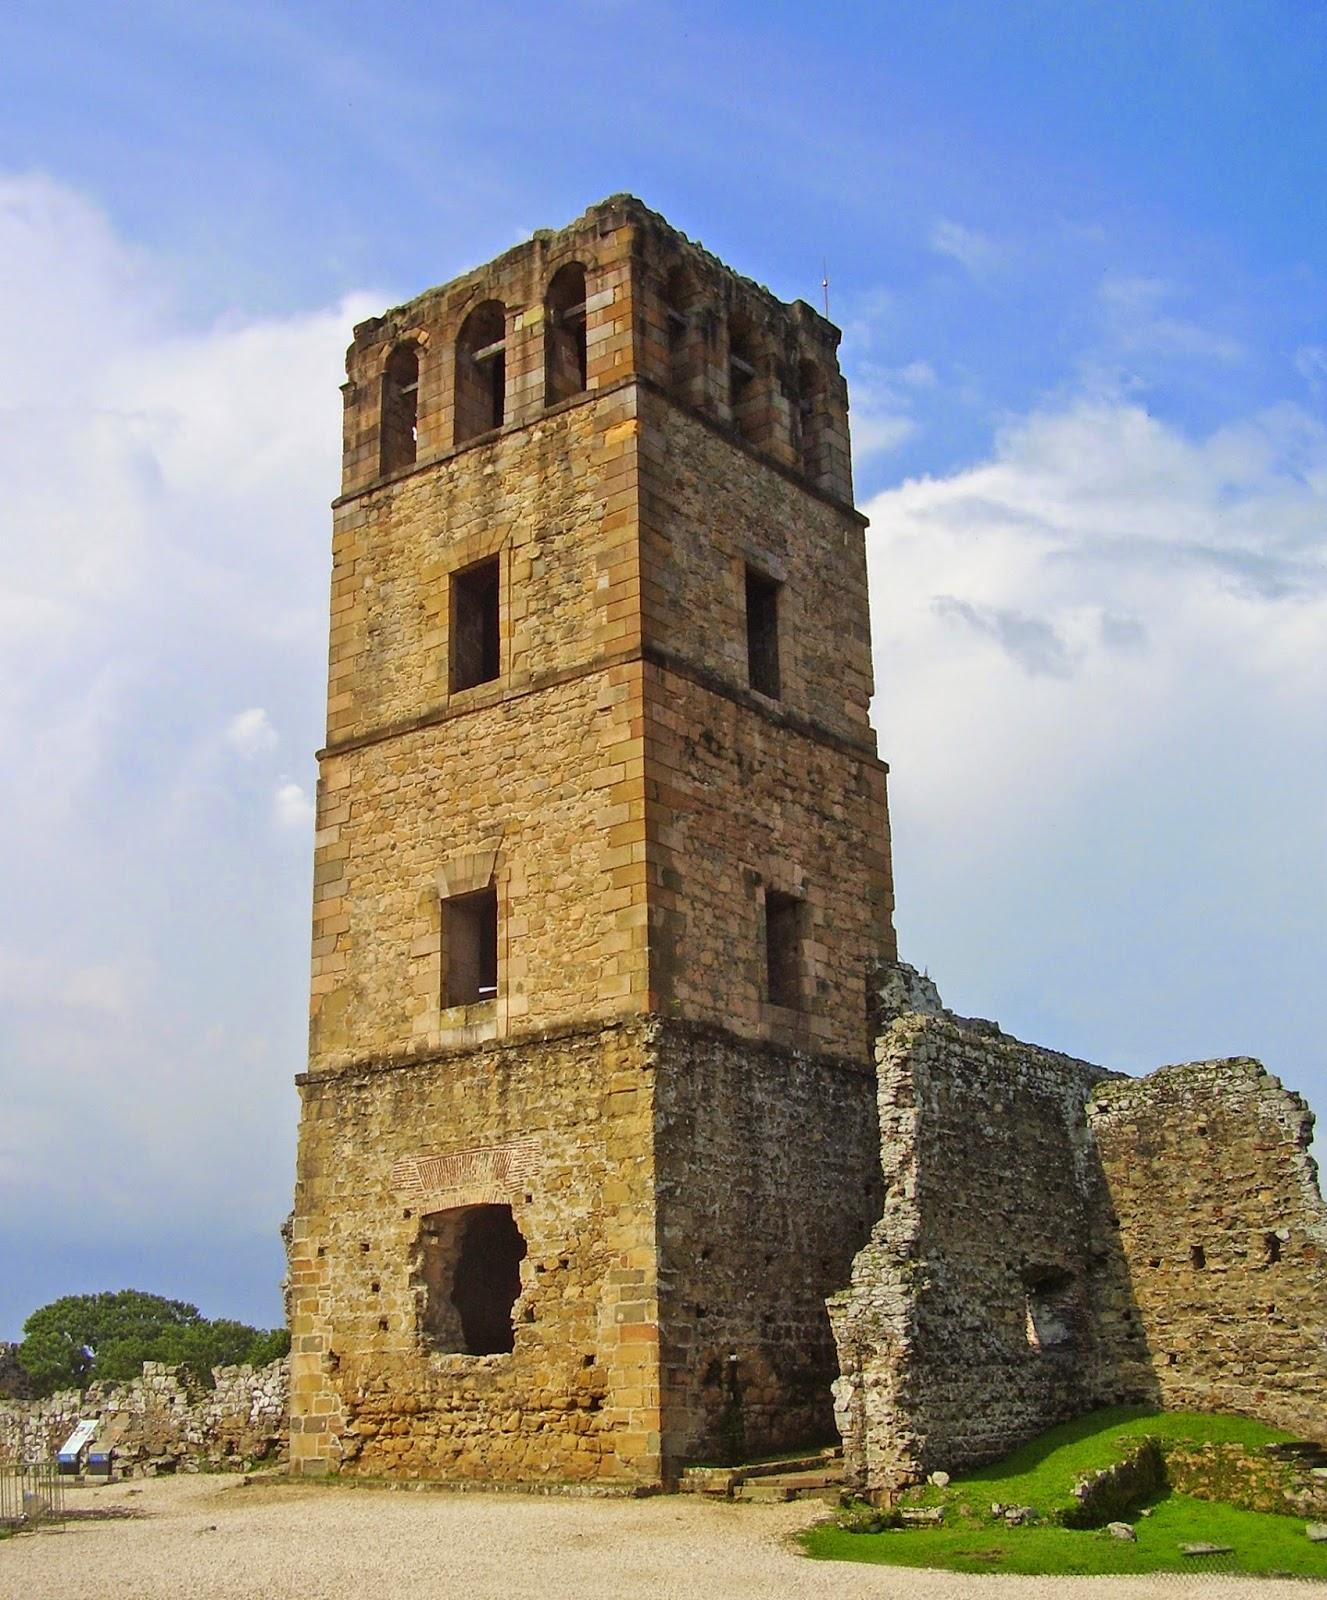 Patrimonio natural y cultural del per patrimonio for Patrimonio mueble